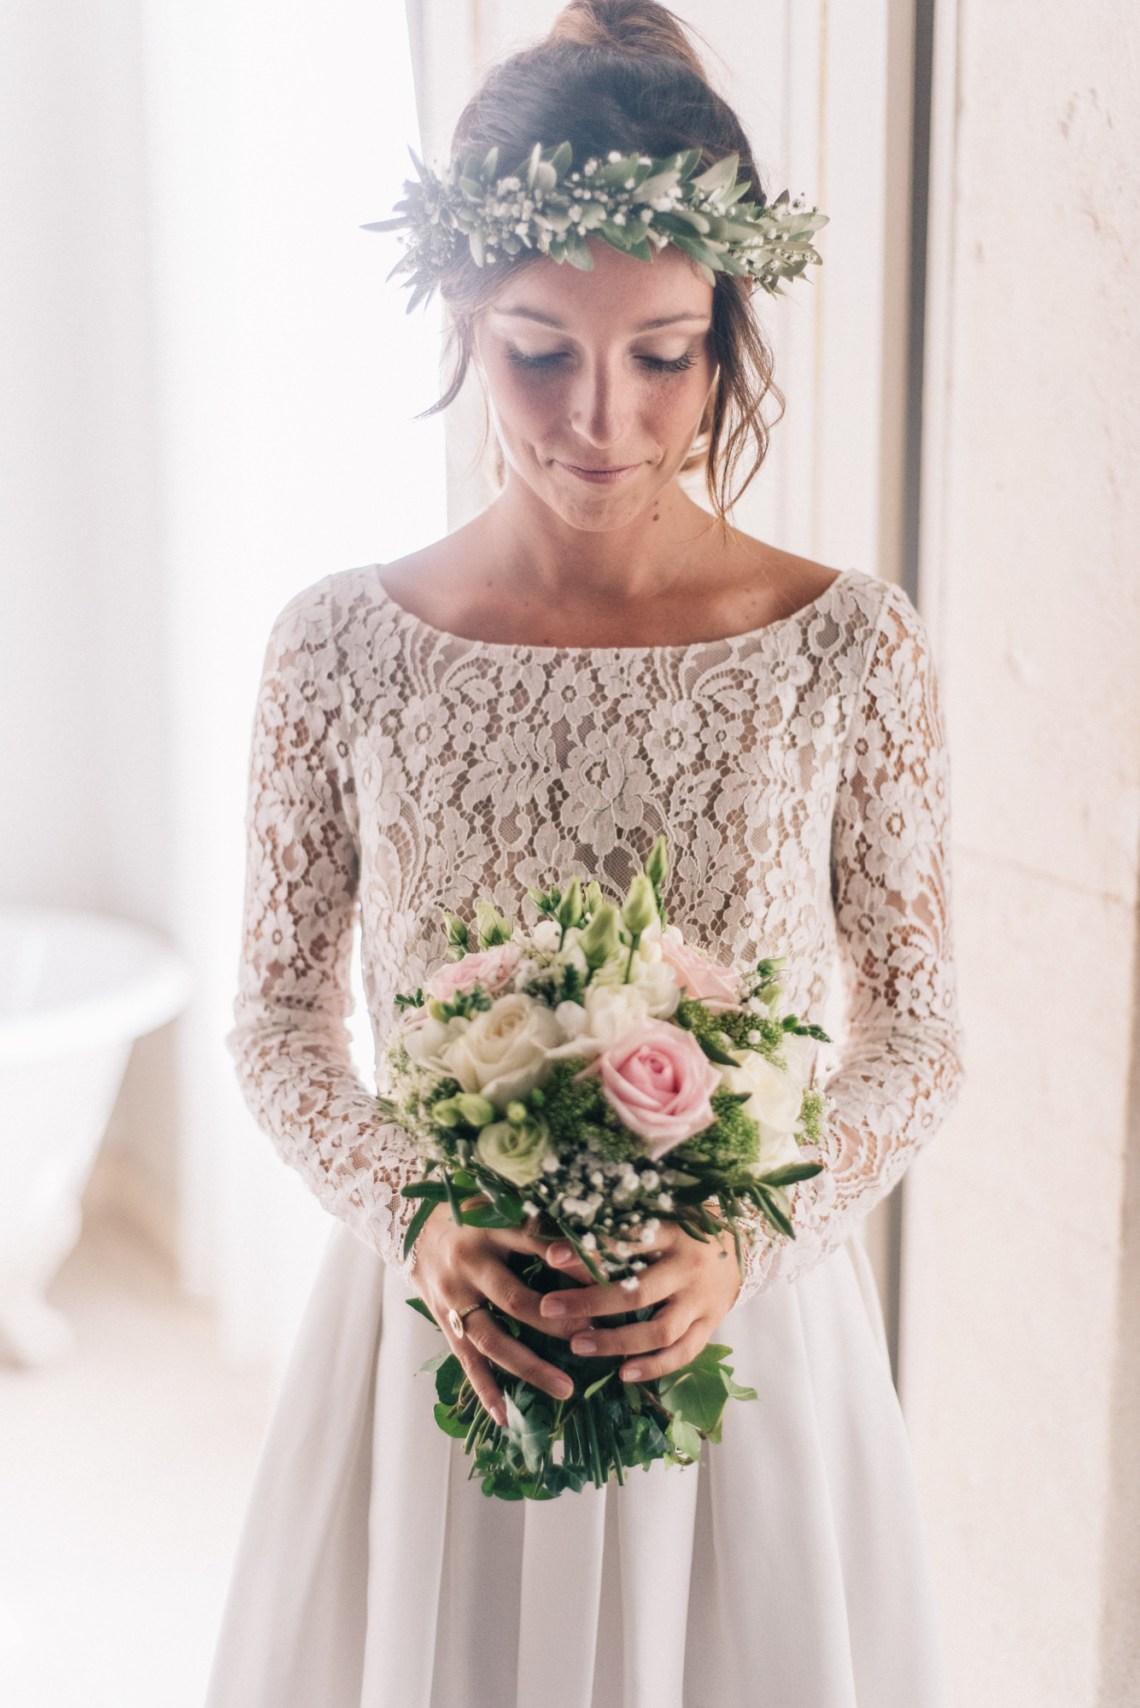 photographe-mariage-paris-angers-nantes-vendee-gard-provence